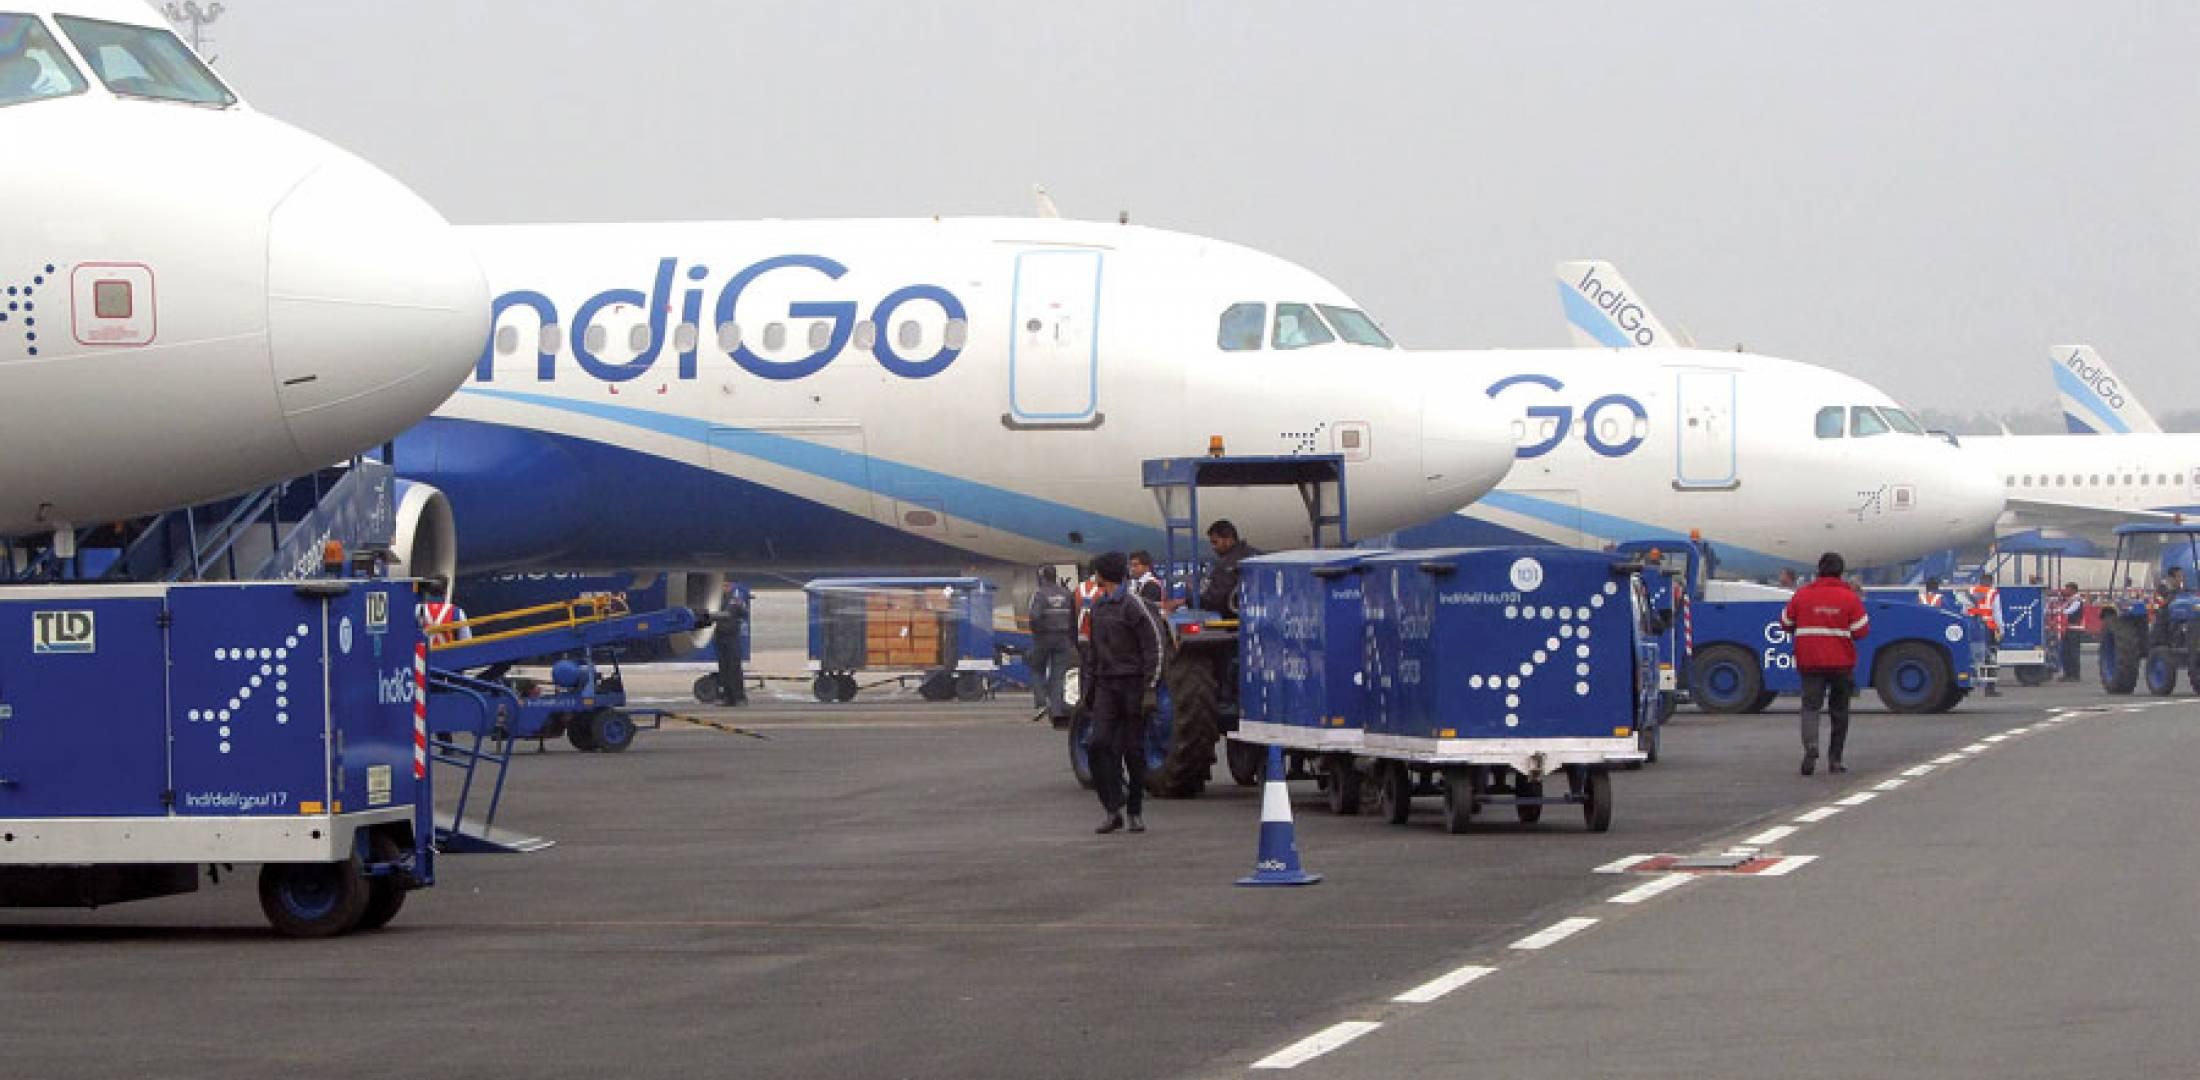 IndiGo seeks staff support amid biggest quarterly loss of Rs 1,062 crore